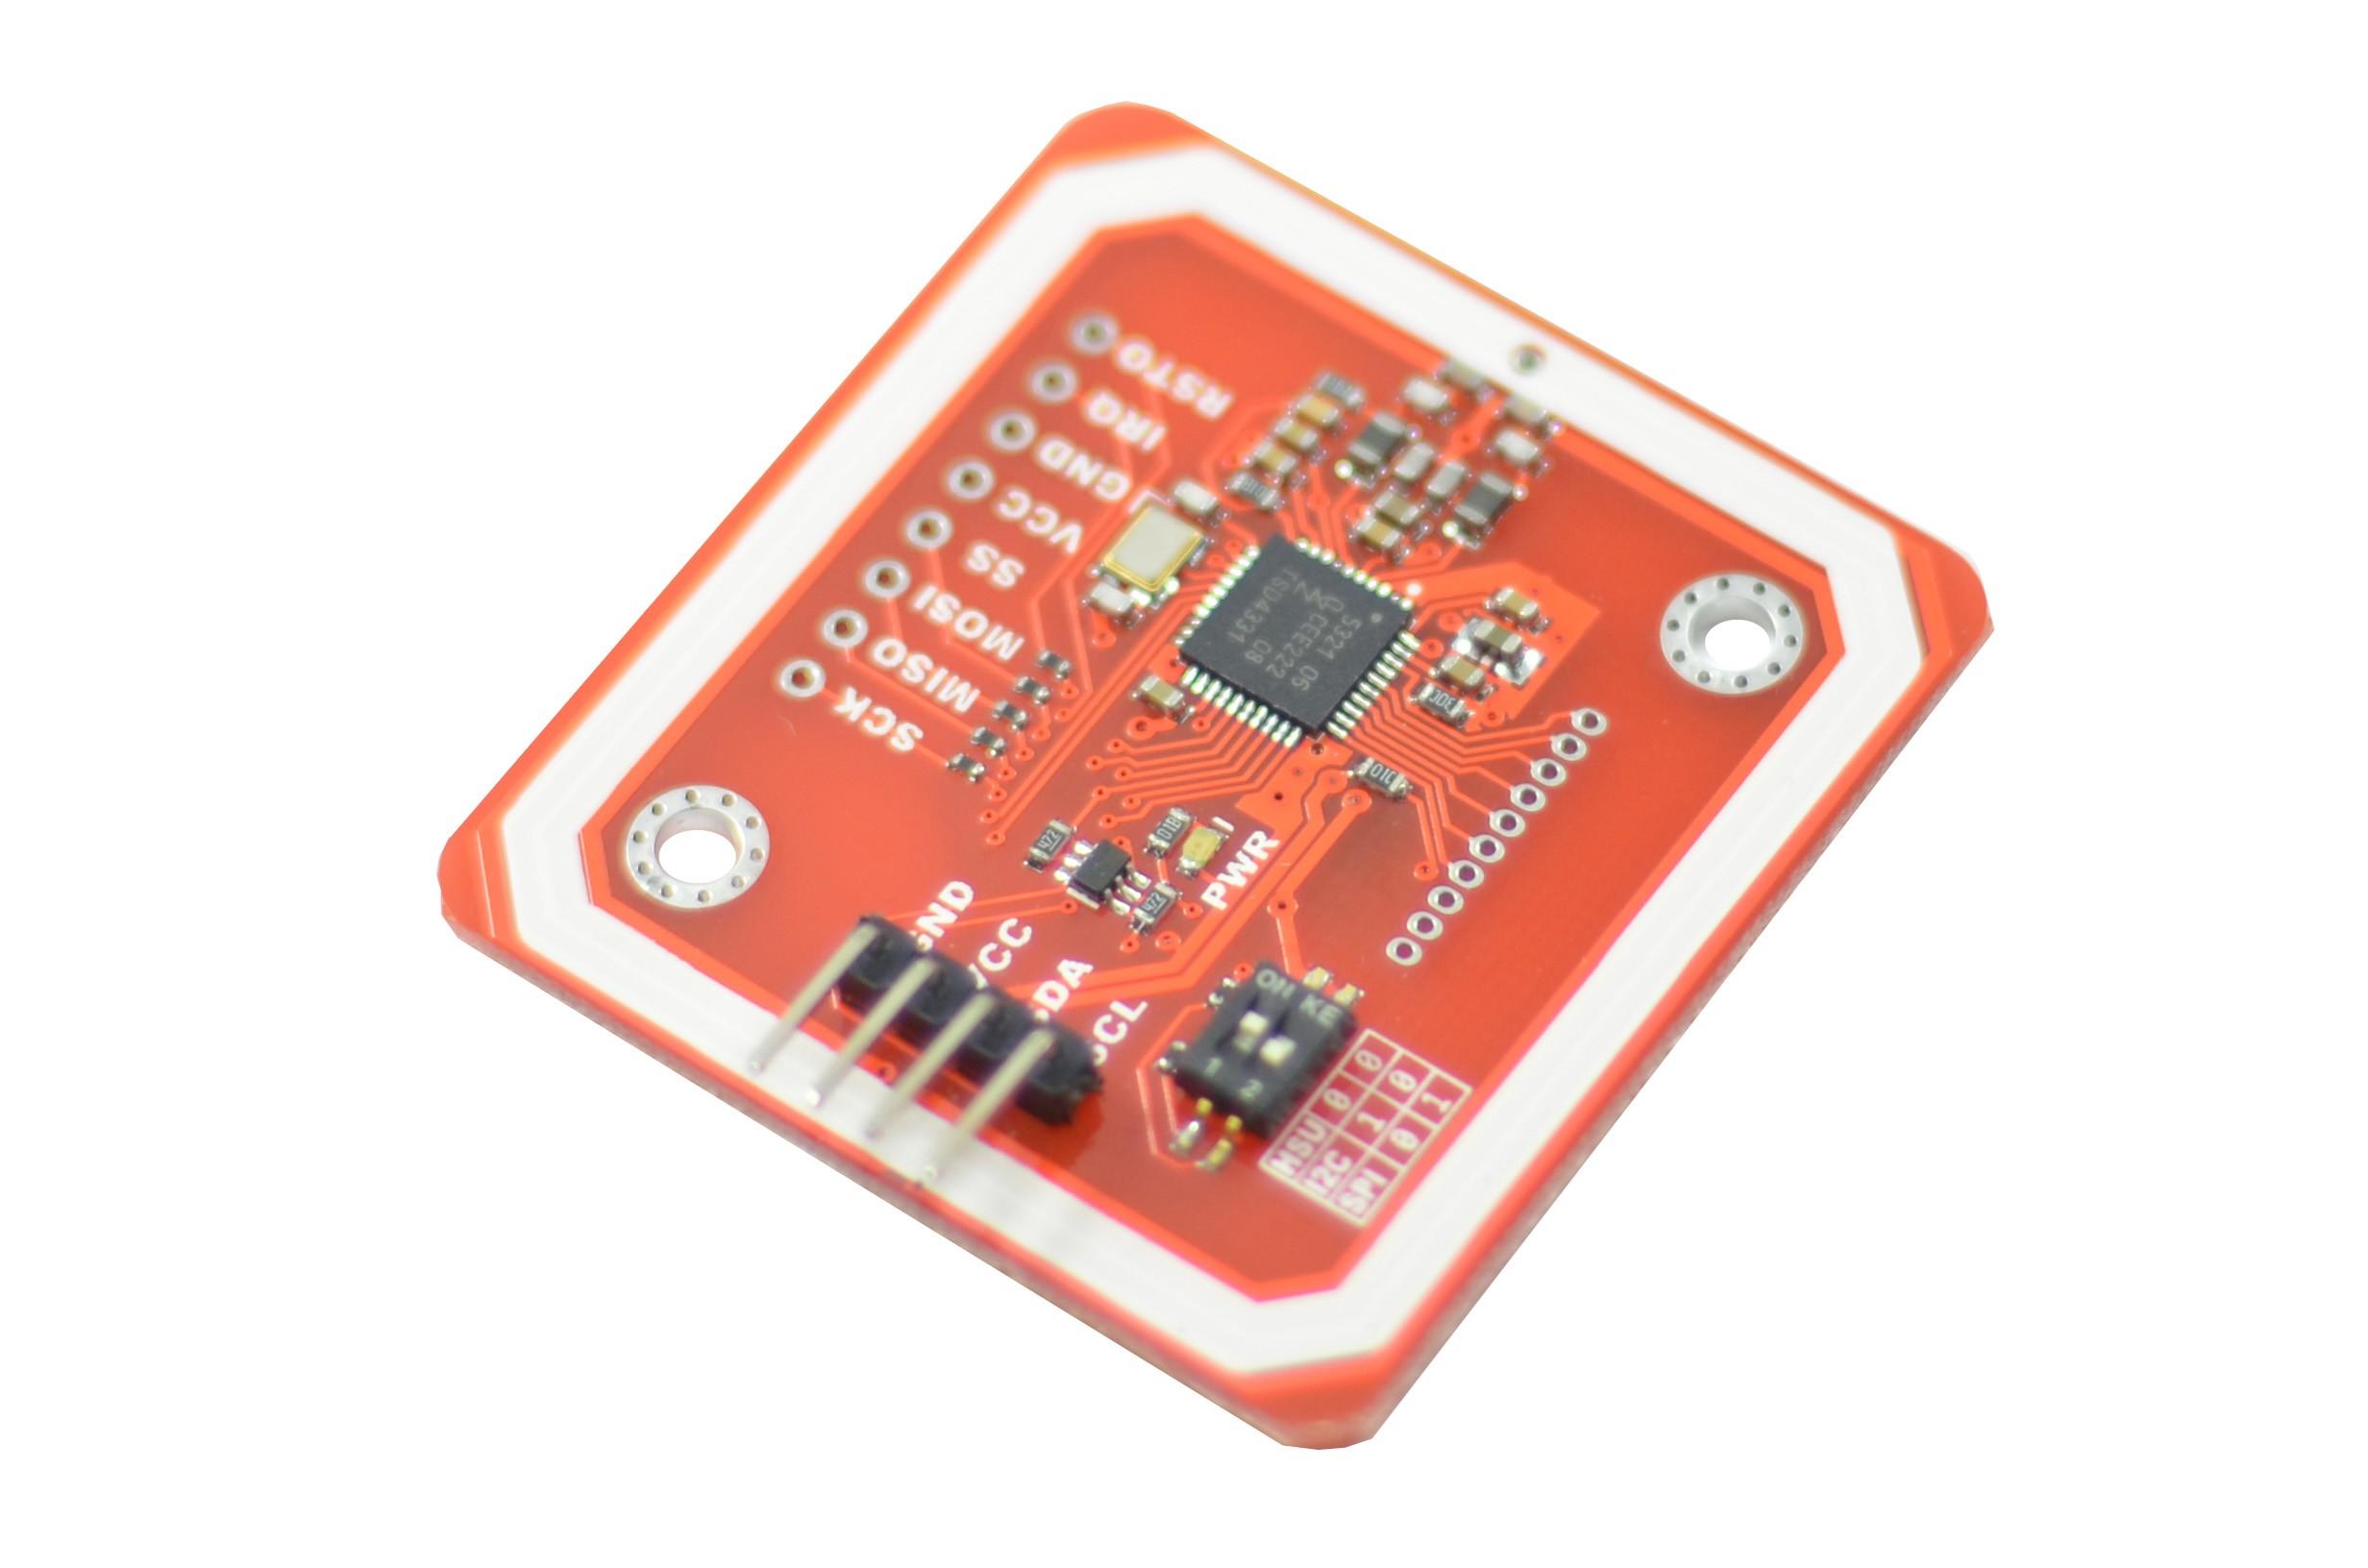 Adafruit PN532 RFID/NFC Breakout and Shield